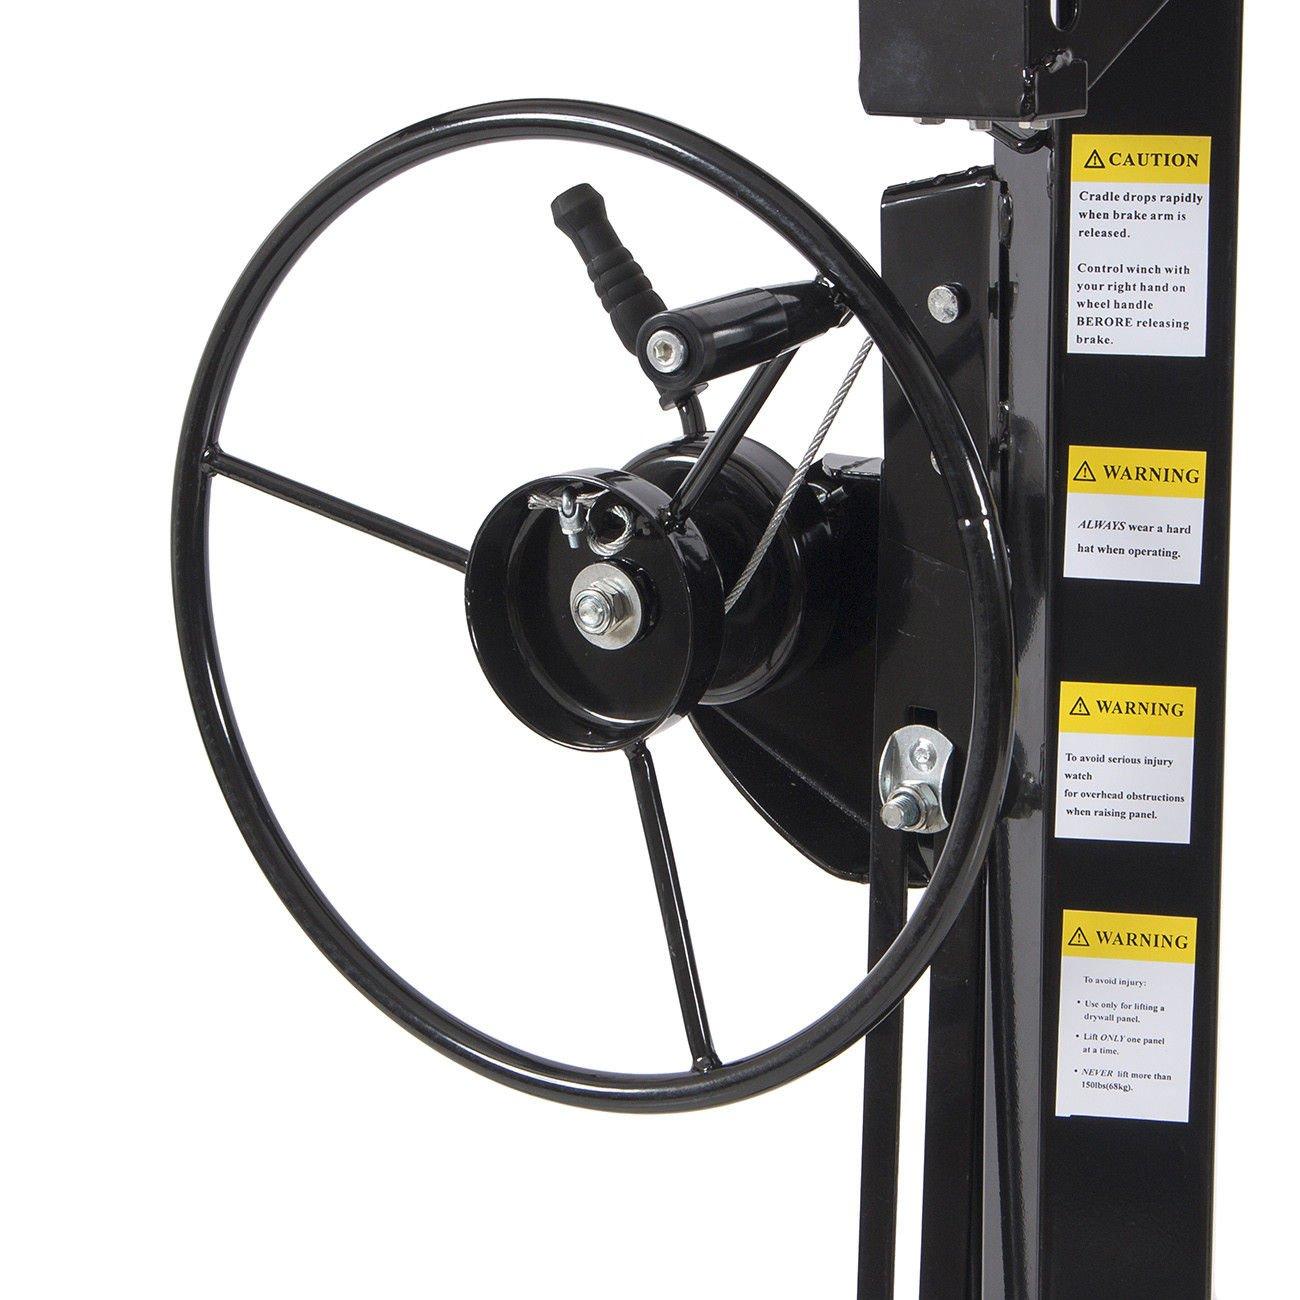 Drywall Lift 11' 15' Lift Panel Hoist Dry Wall Jack Lifter Construction -Black by Happybeamy (Image #4)